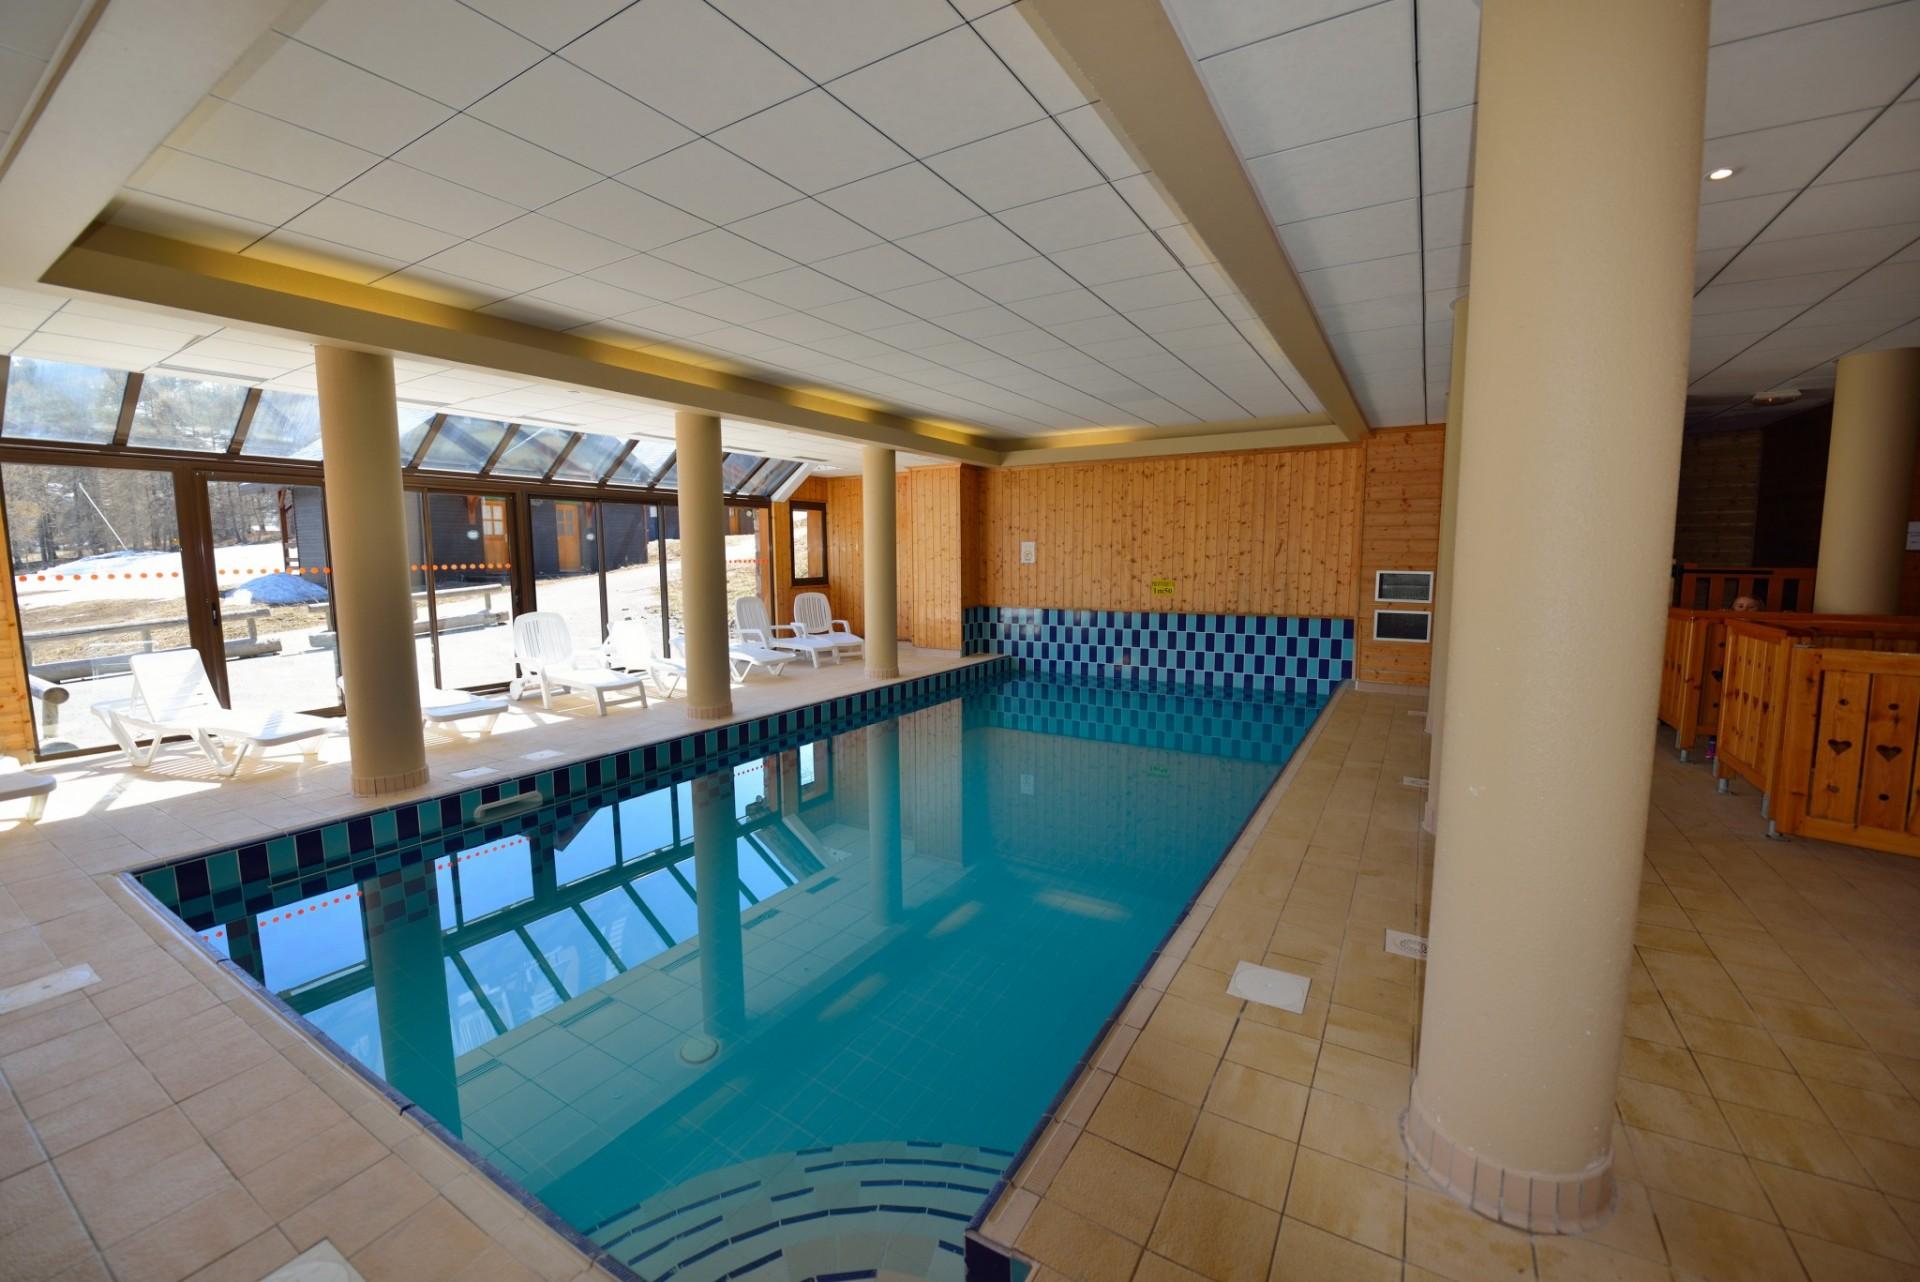 01-piscine-2-27346